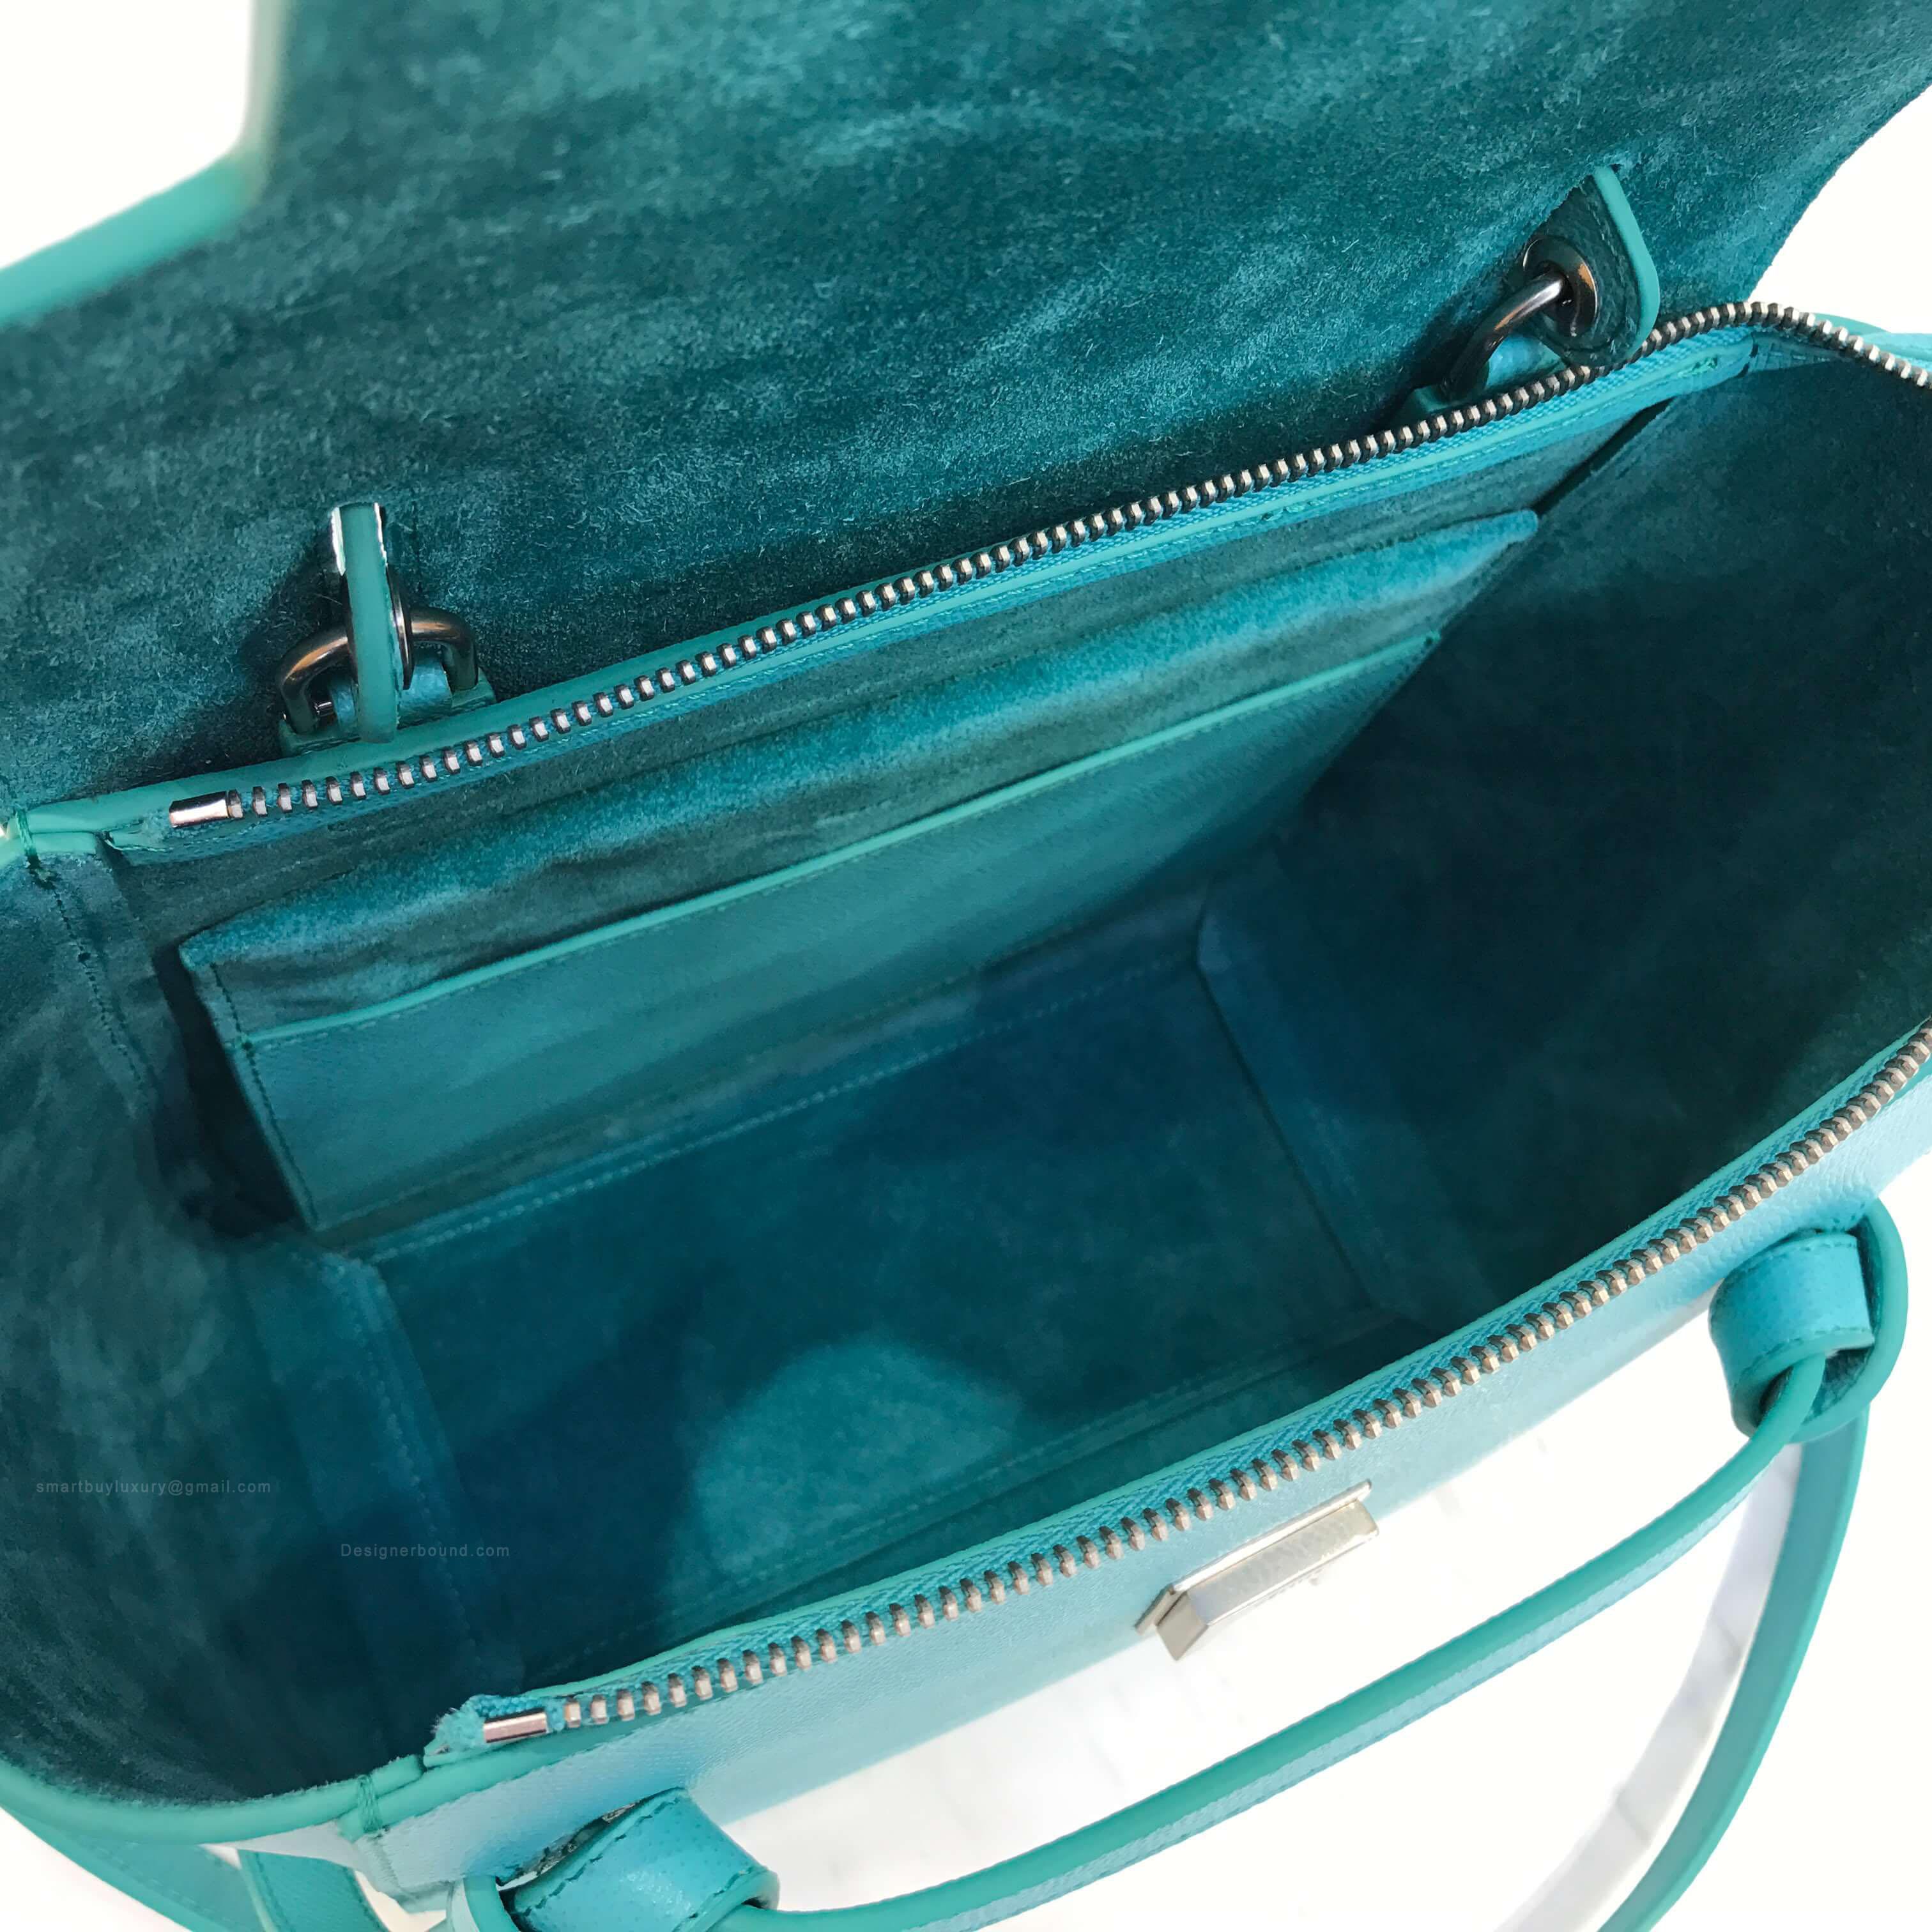 88ed566aefcc Celine Micro Belt Bag in Cactus Grained Calfskin. CELINE ...